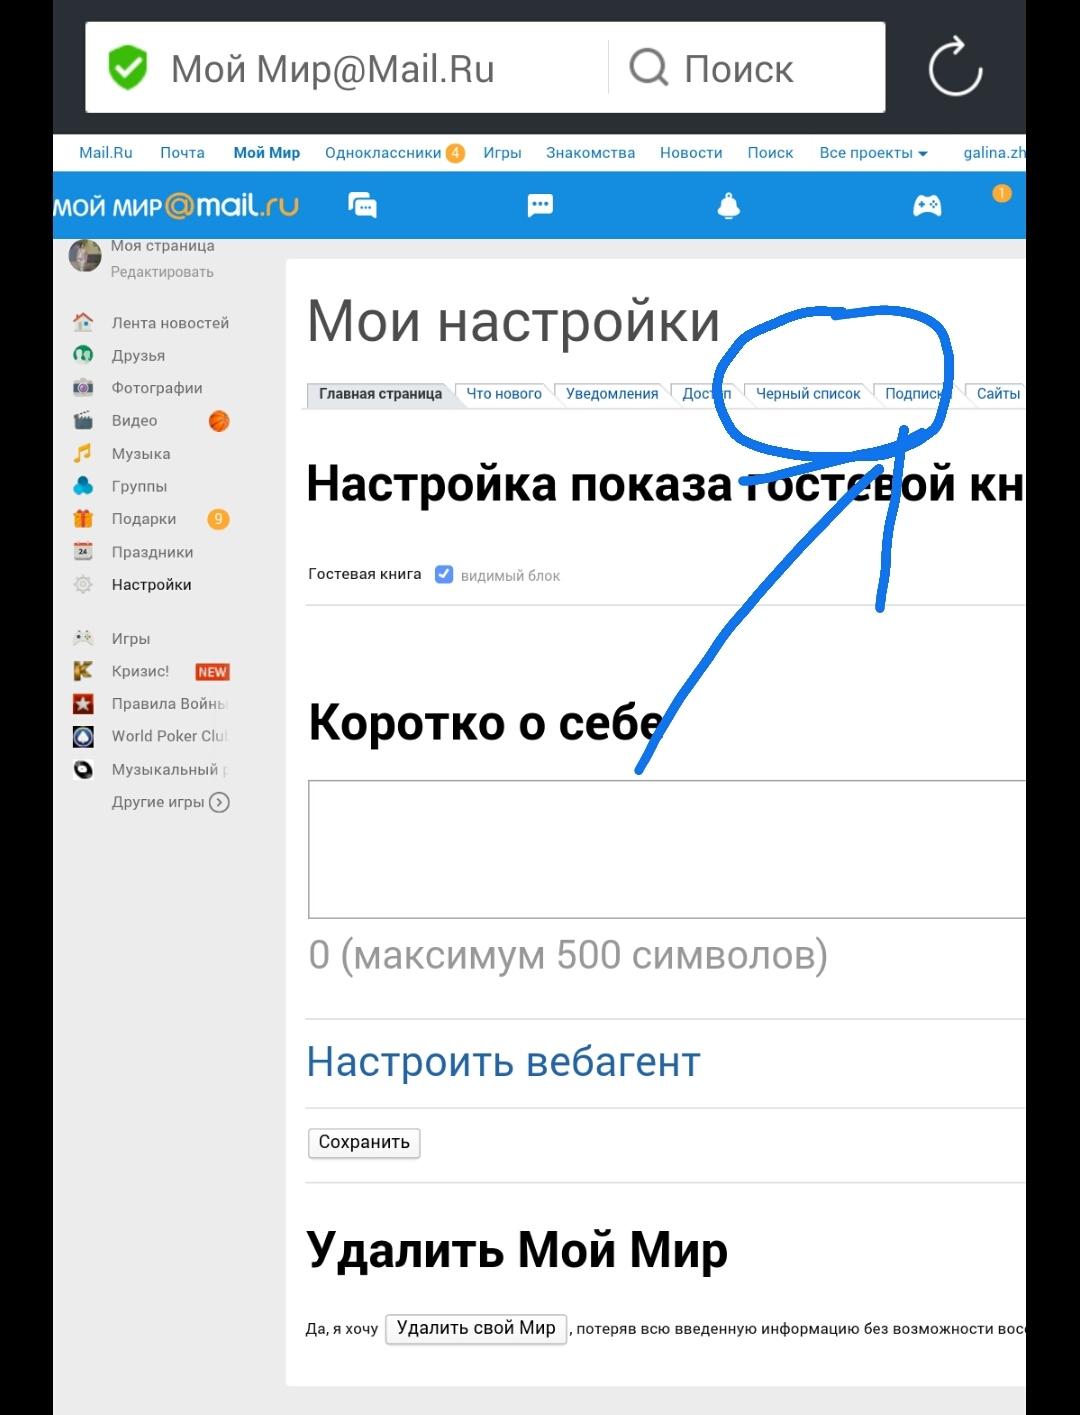 знакомства фото mail к включить доступ